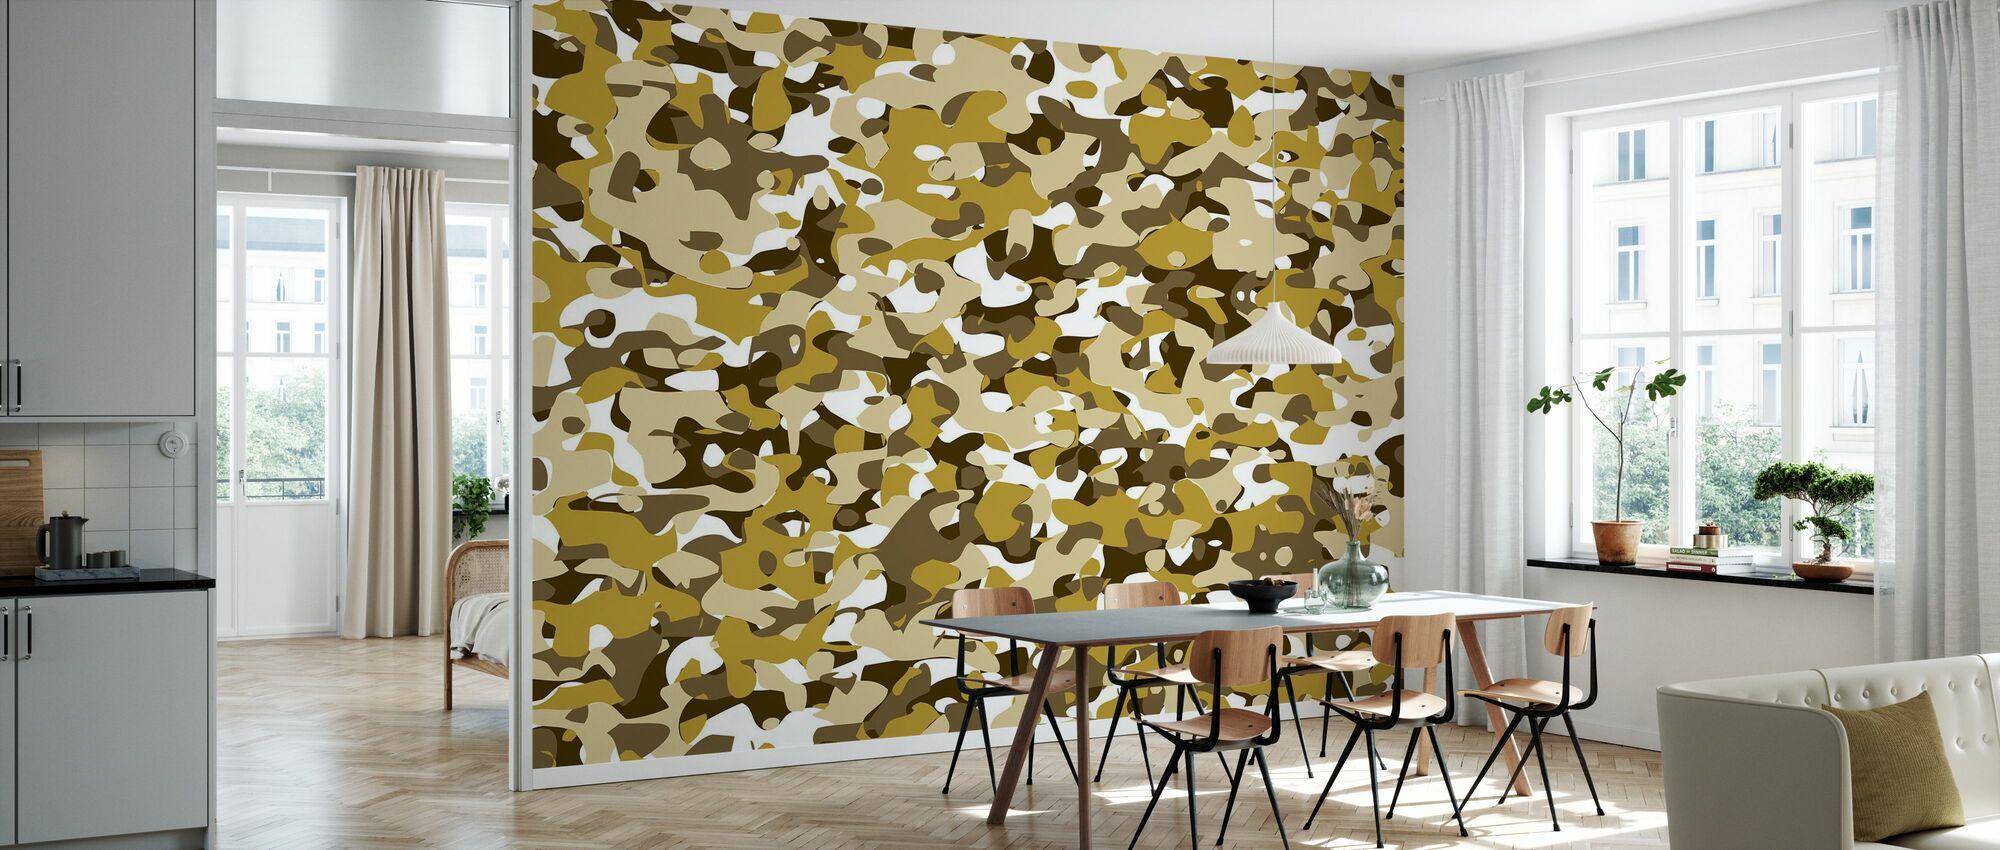 Camouflage - Yellow - Wallpaper - Kitchen